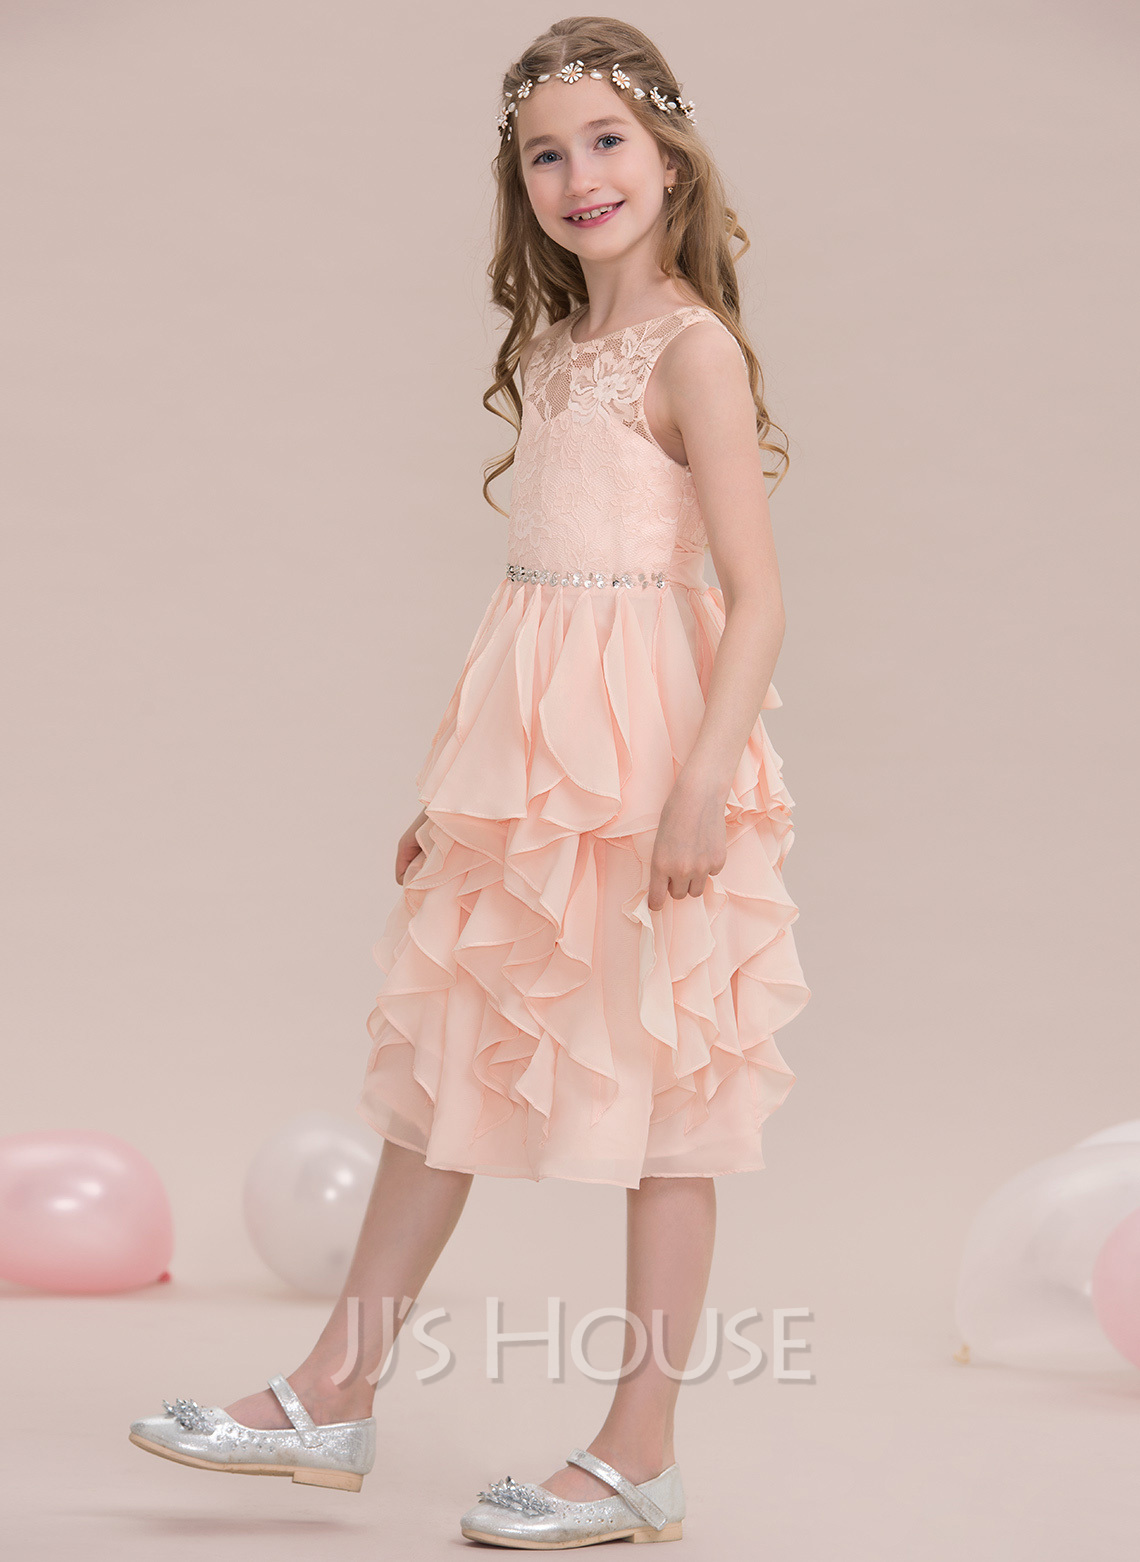 A-Line Scoop Neck Knee-Length Chiffon Junior Bridesmaid Dress With Beading Sequins Cascading Ruffles